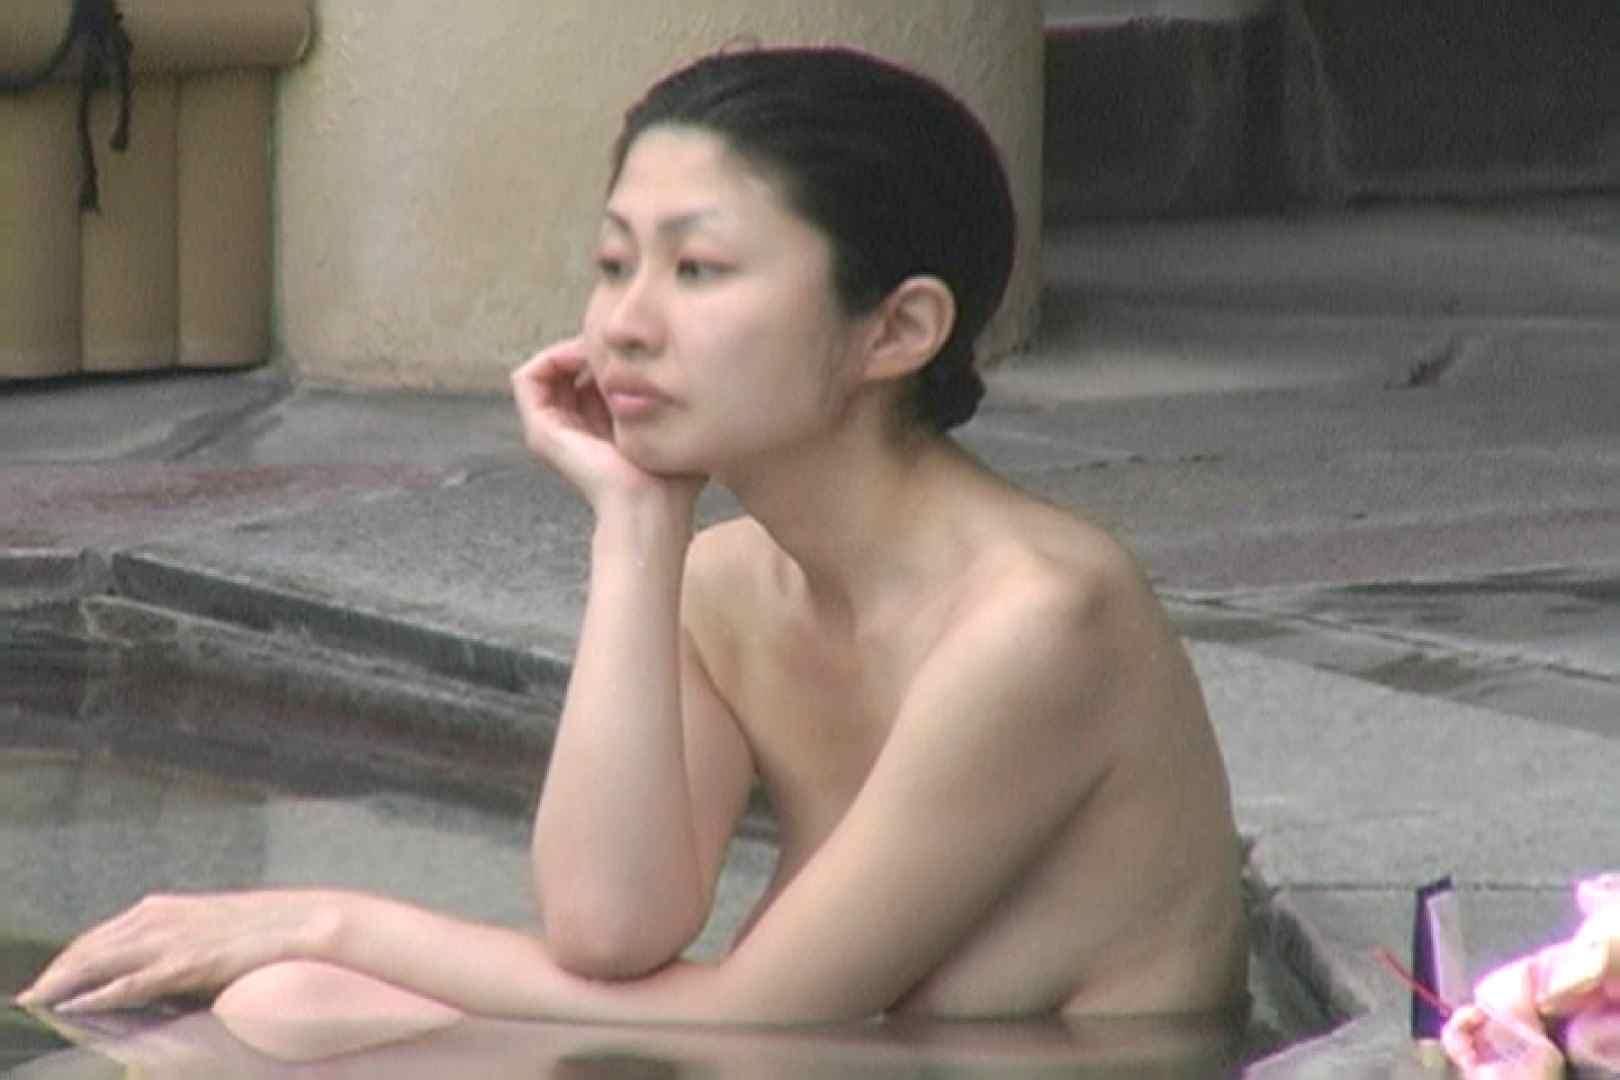 Aquaな露天風呂Vol.642 盗撮師作品 セックス画像 86pic 44